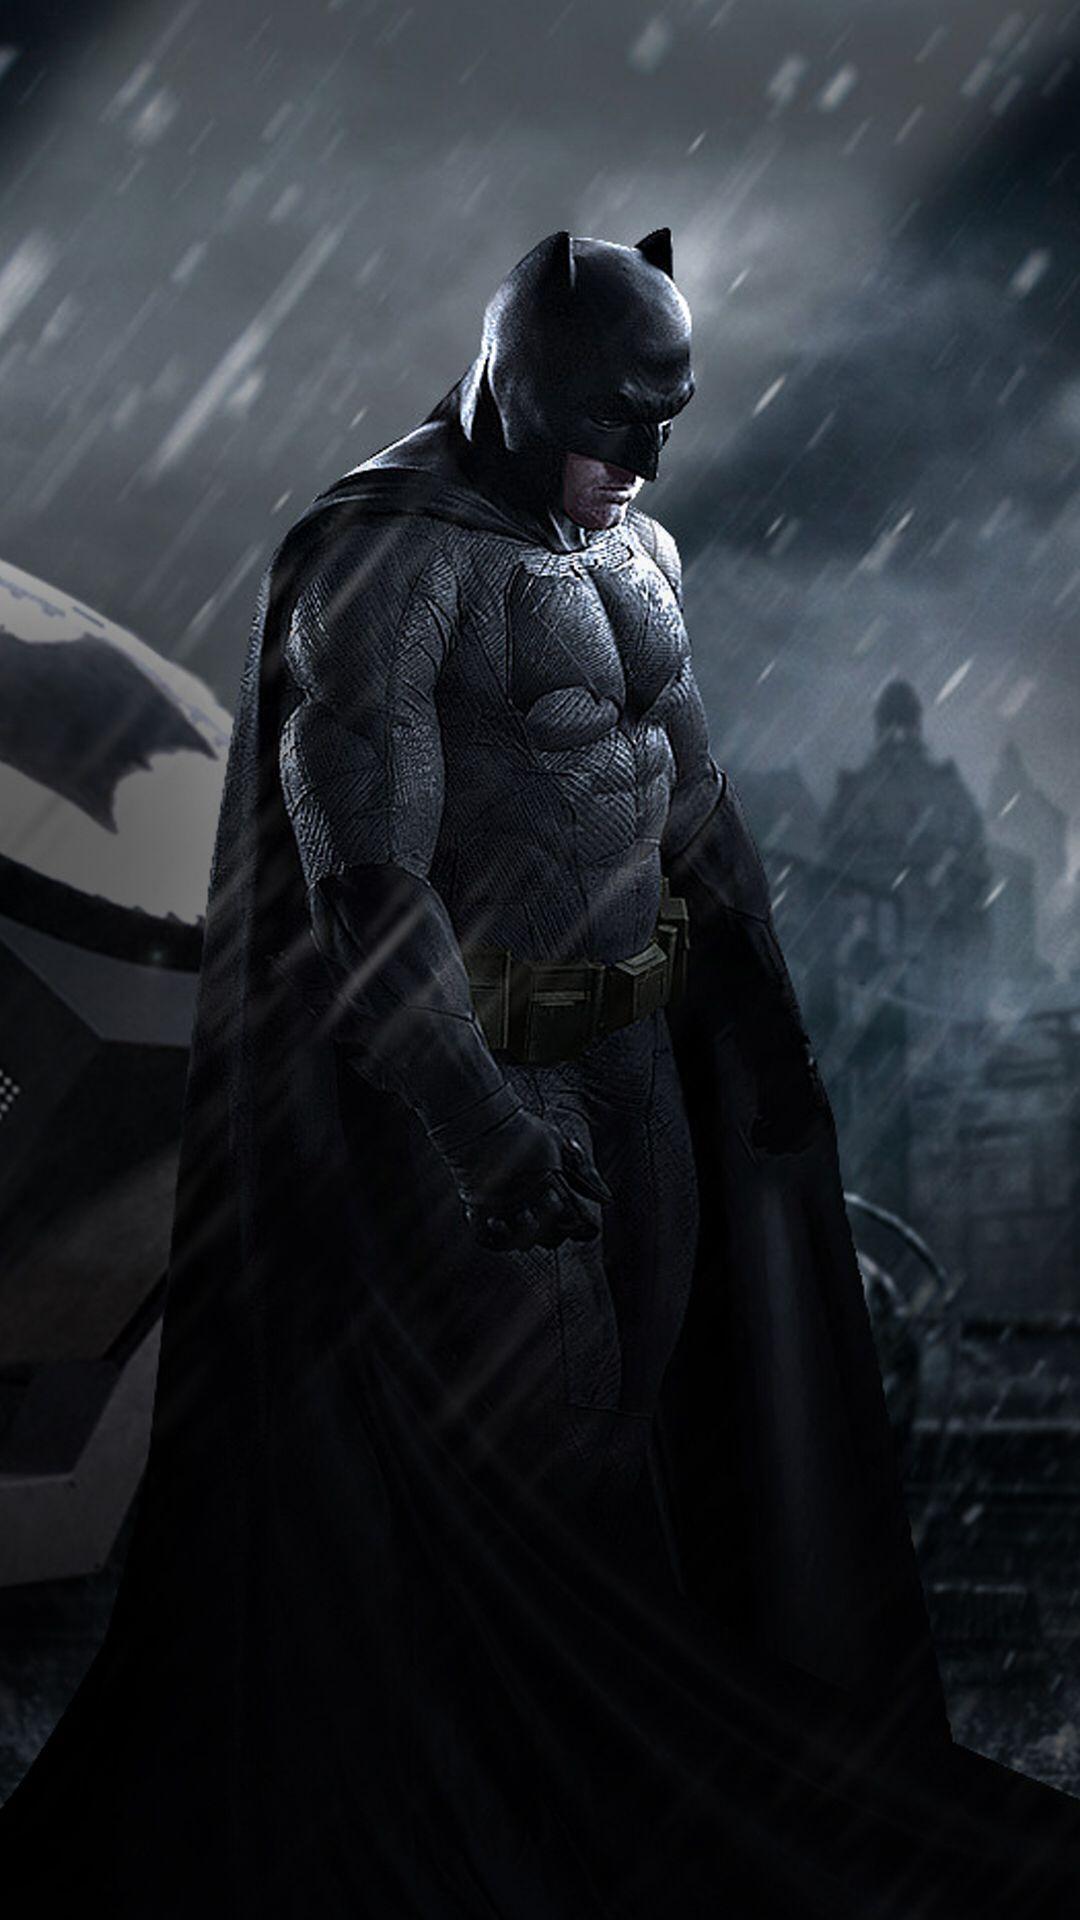 batman hd wallpaper for android